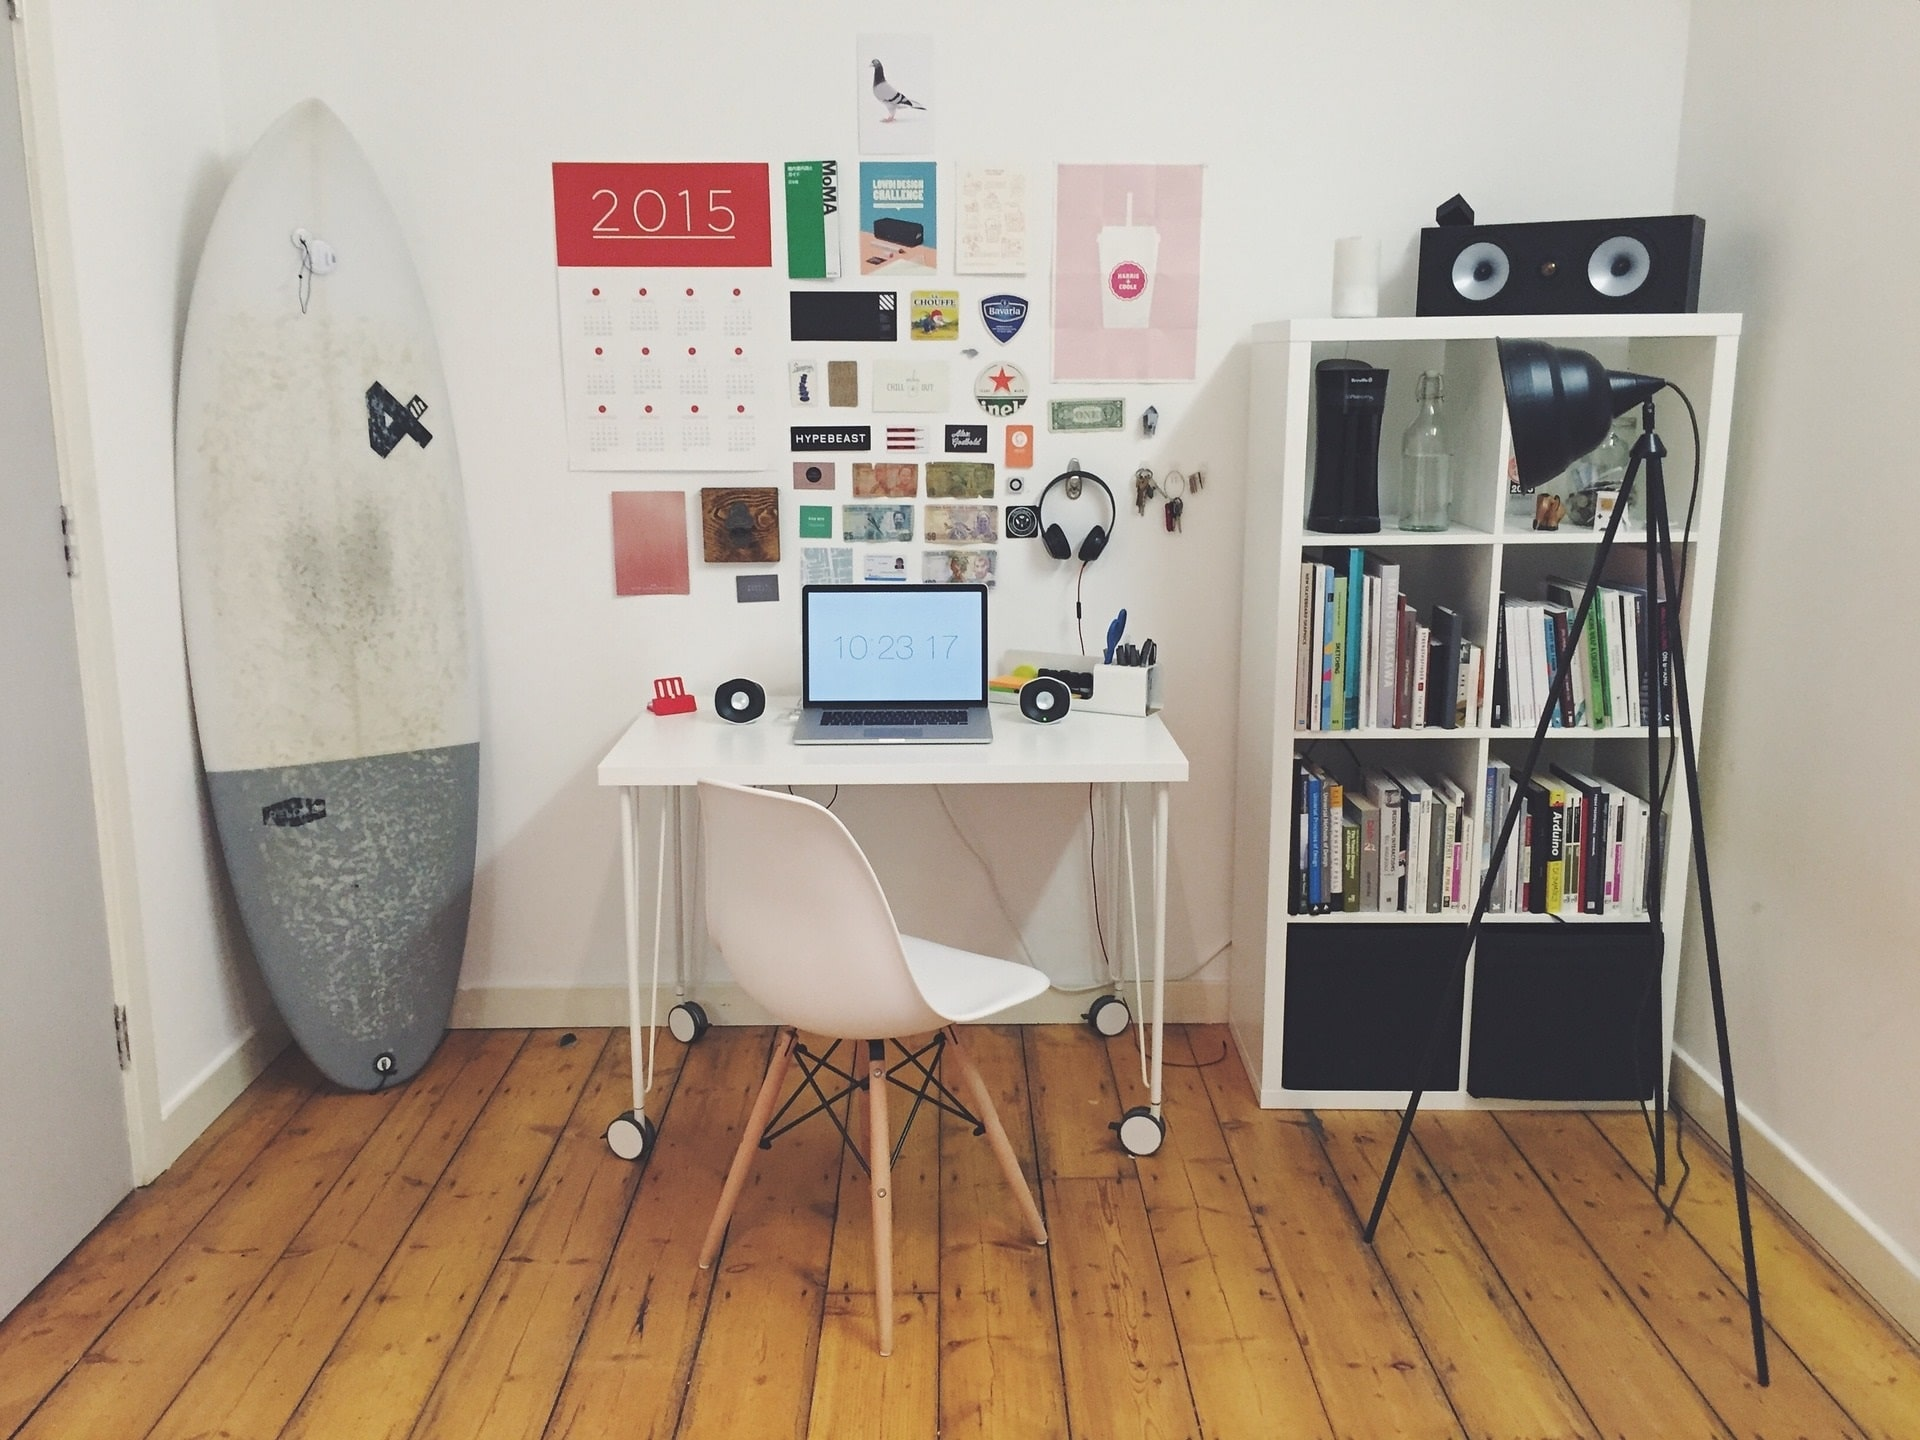 Home Office Arbeitnehmer Arbeitgeber Planen - rockydurham.com -